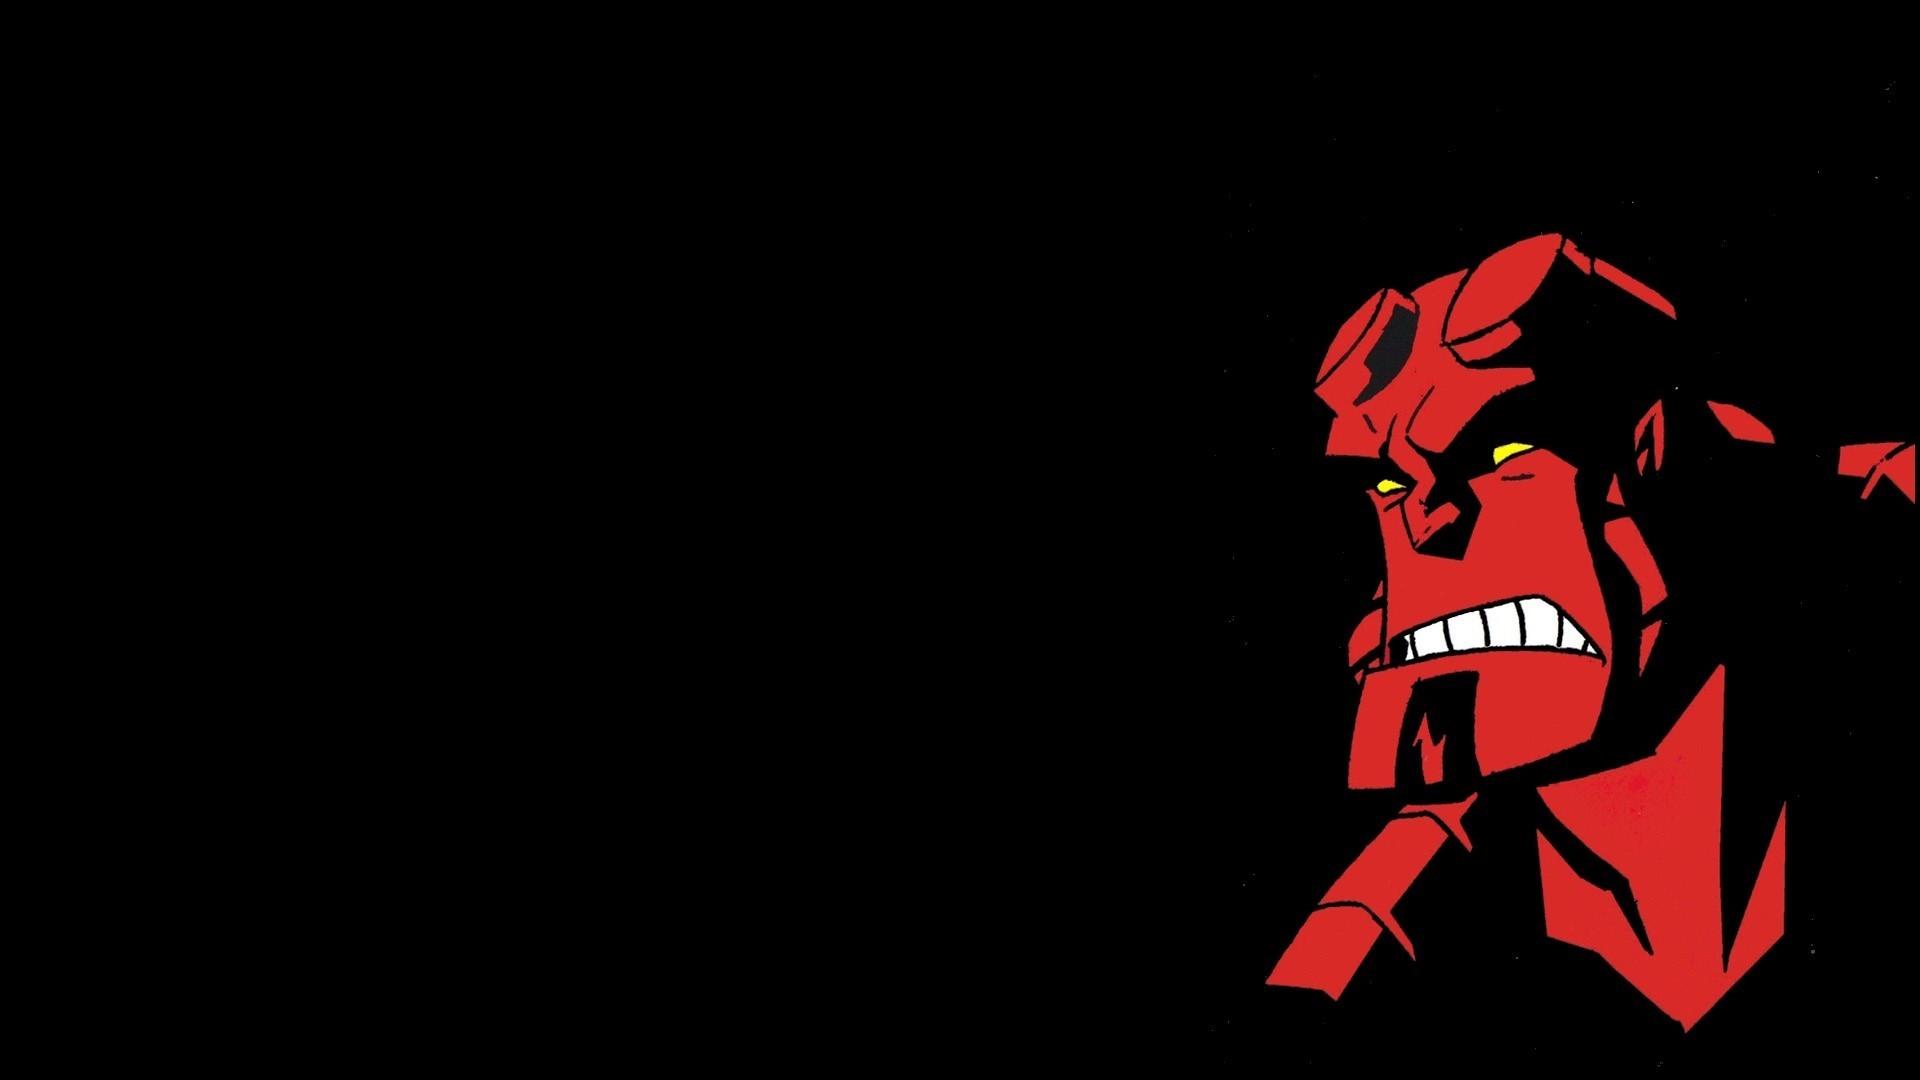 hellboy 2k duvar kağıtları